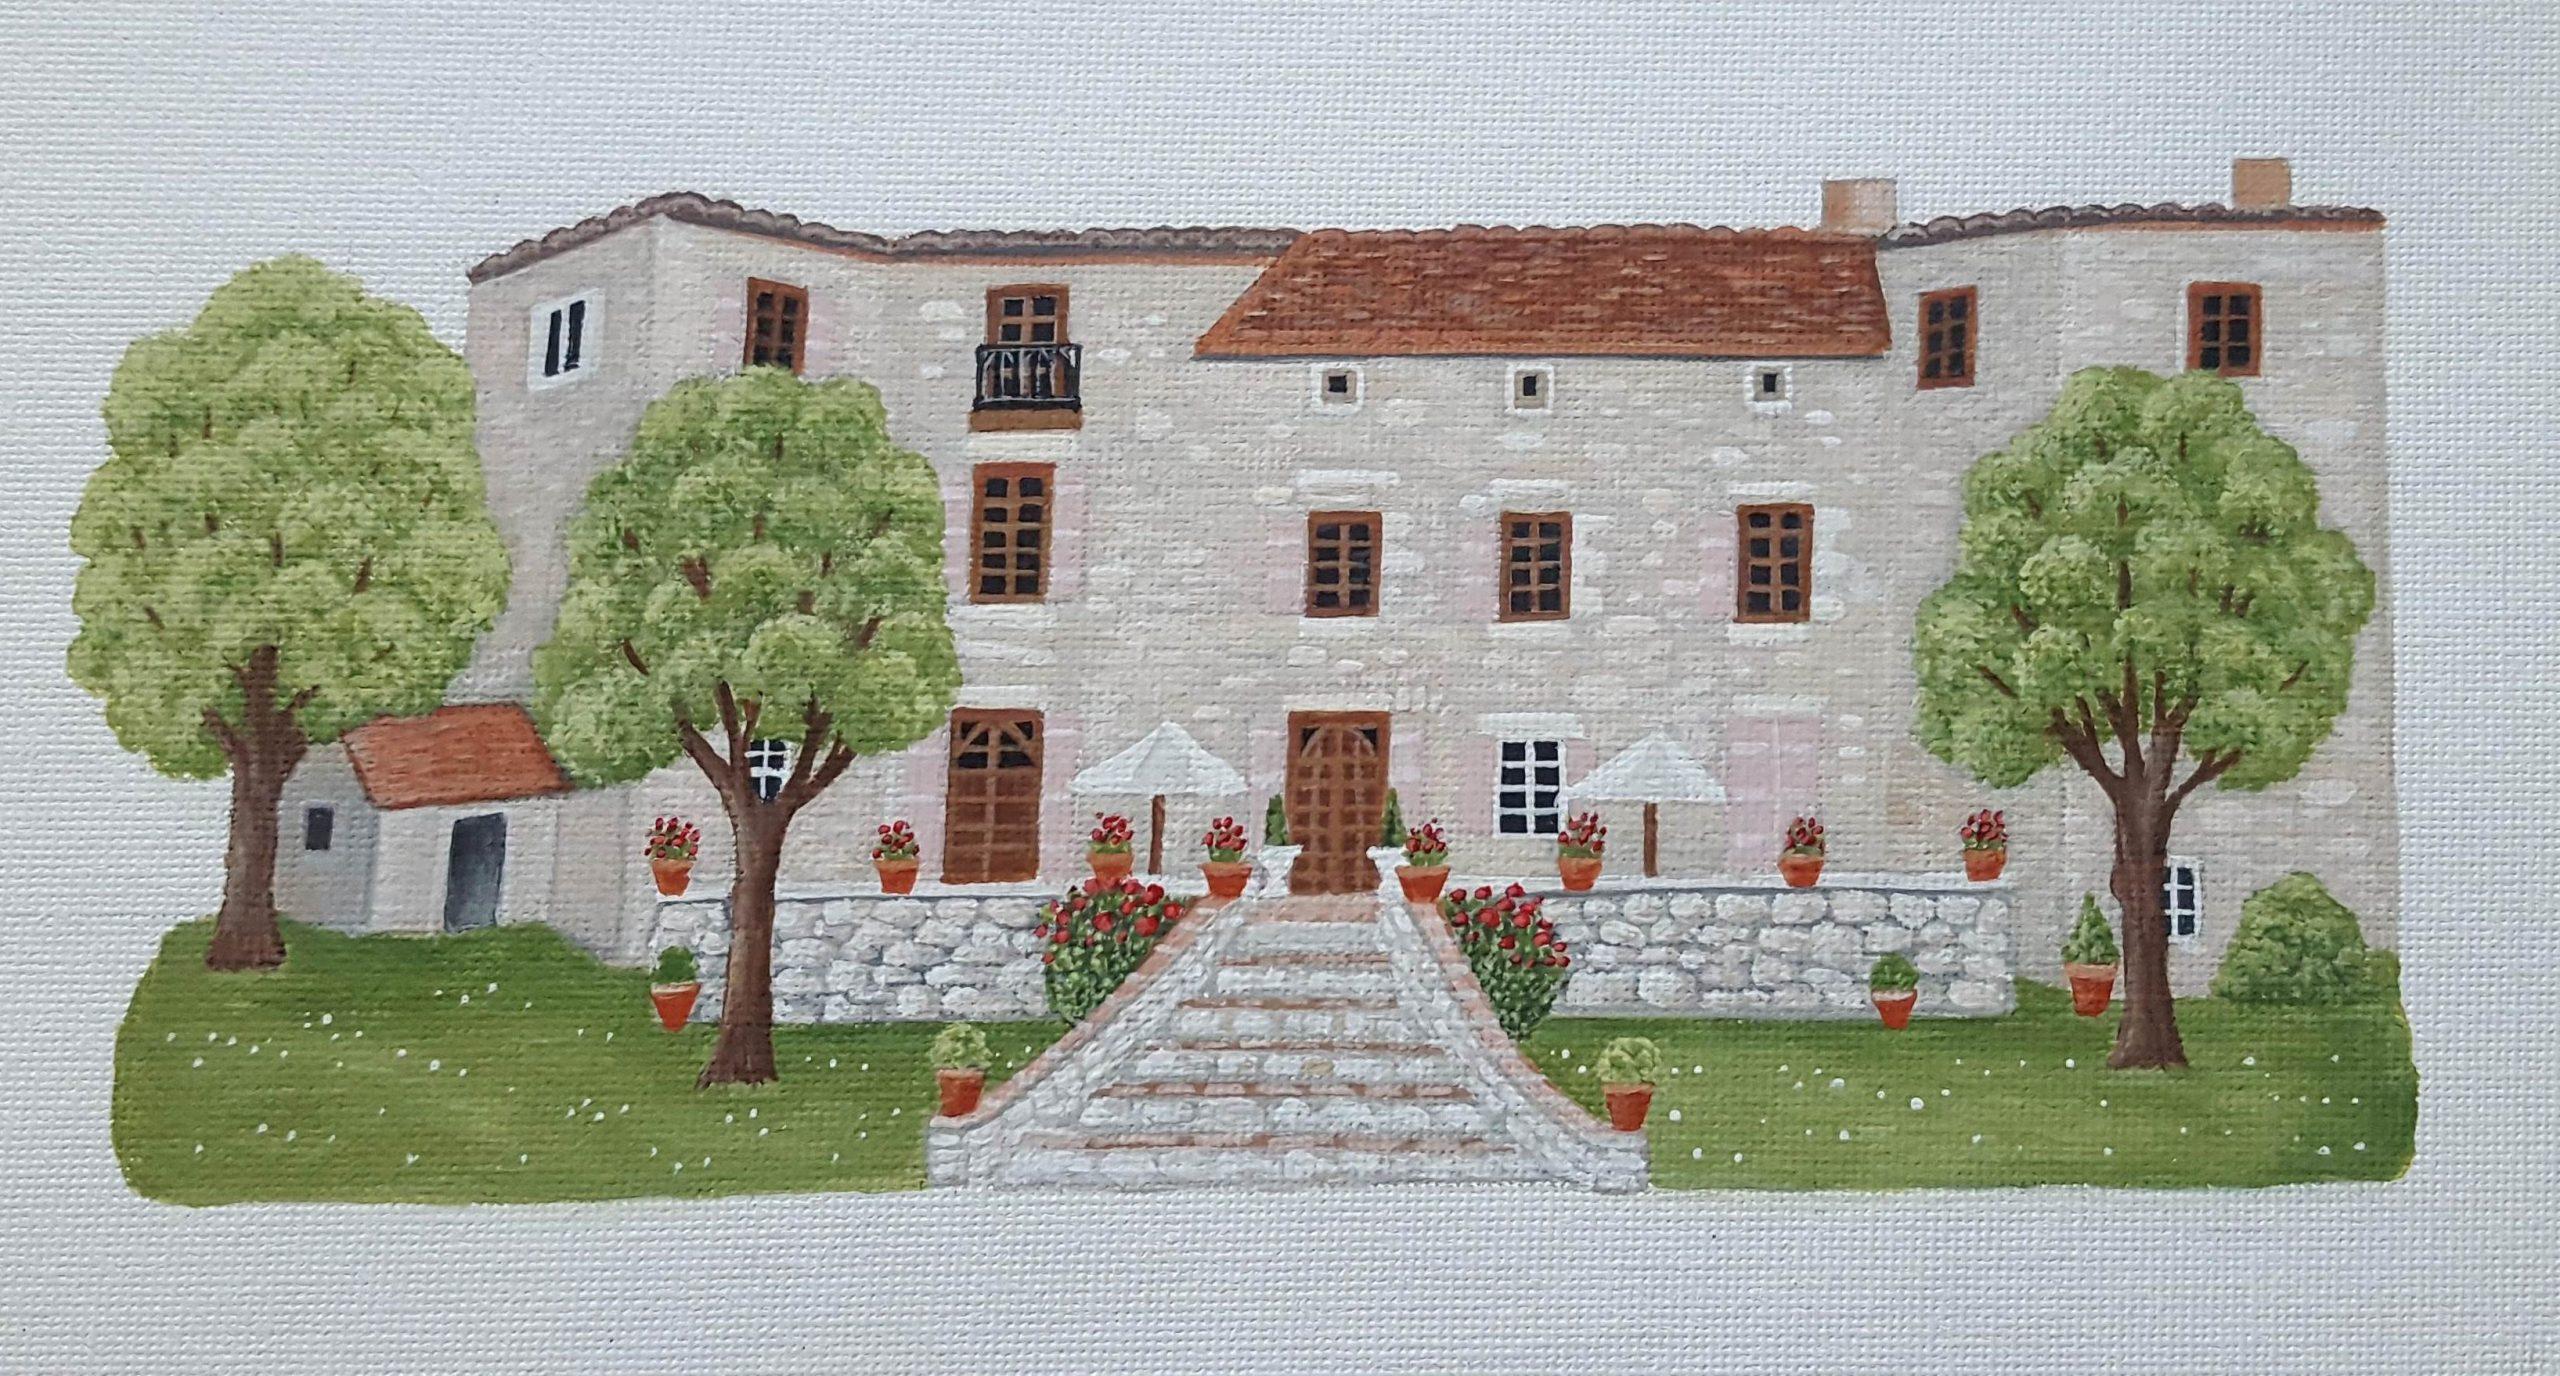 Chateau de Brametourte Courtesy of Artist Sheila Roper